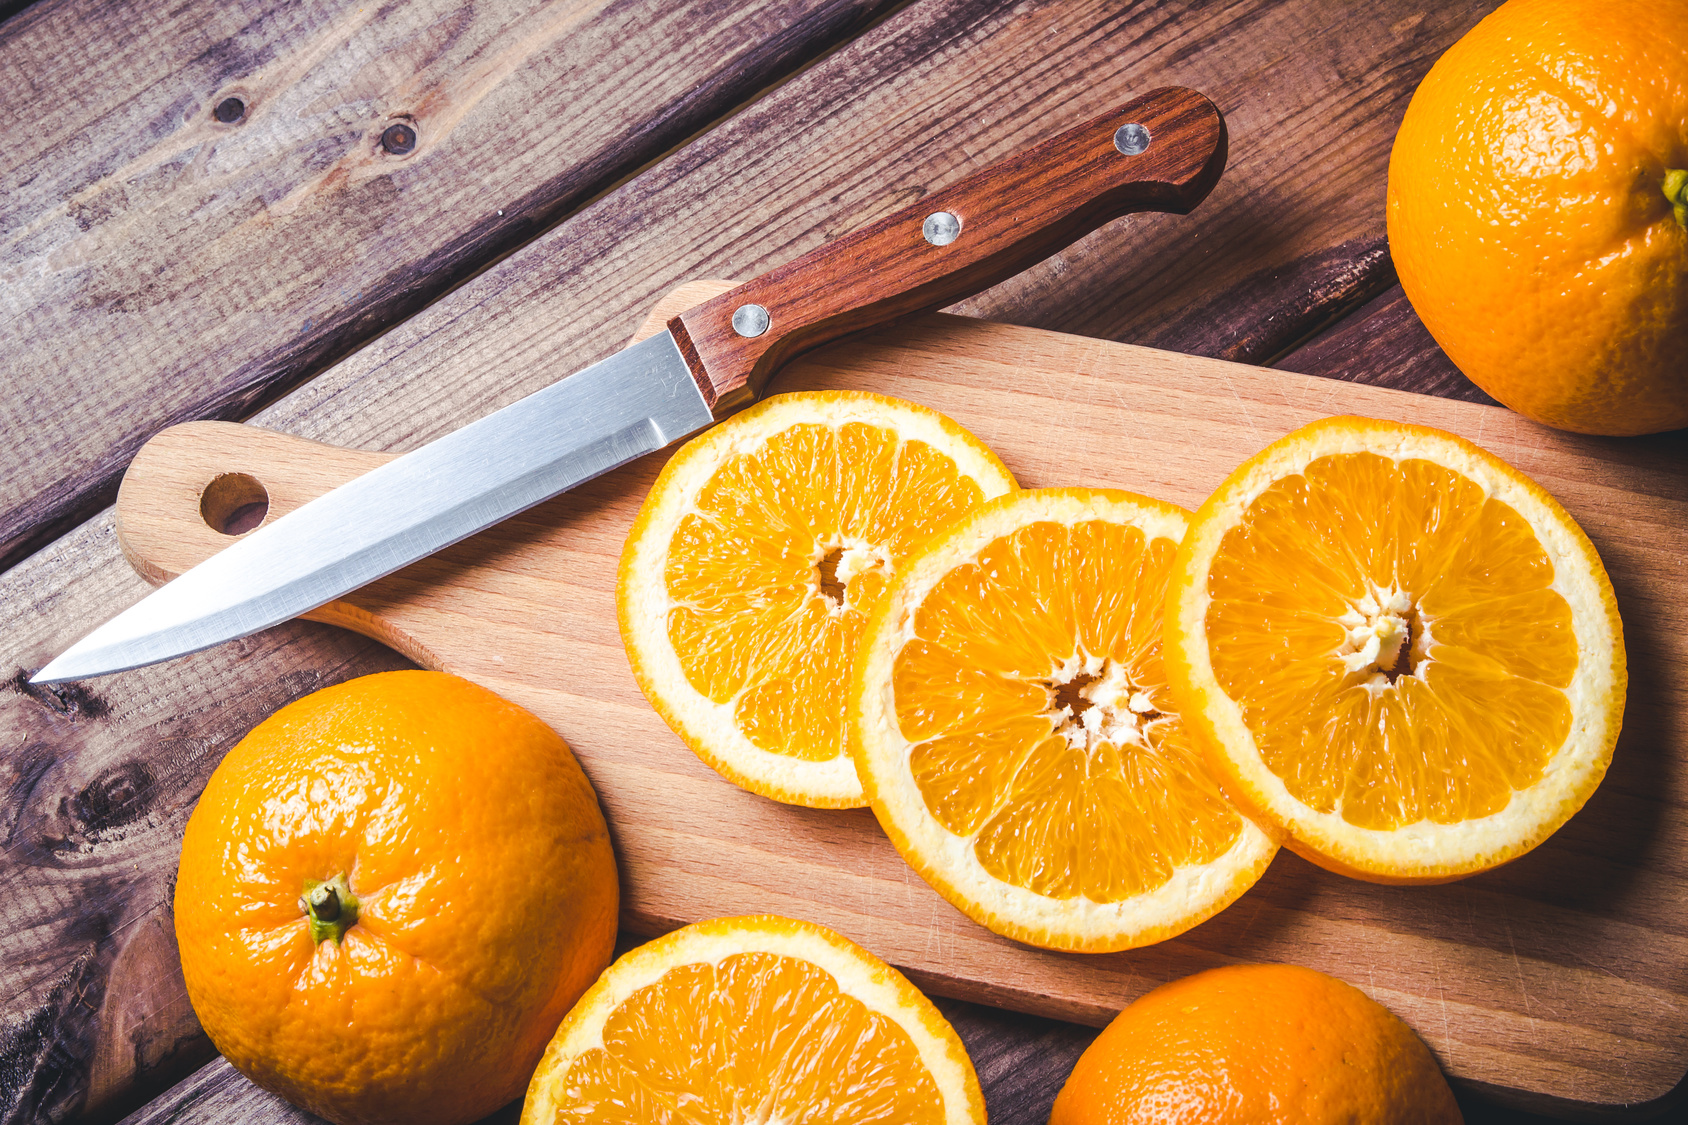 Orange slices on wooden table.